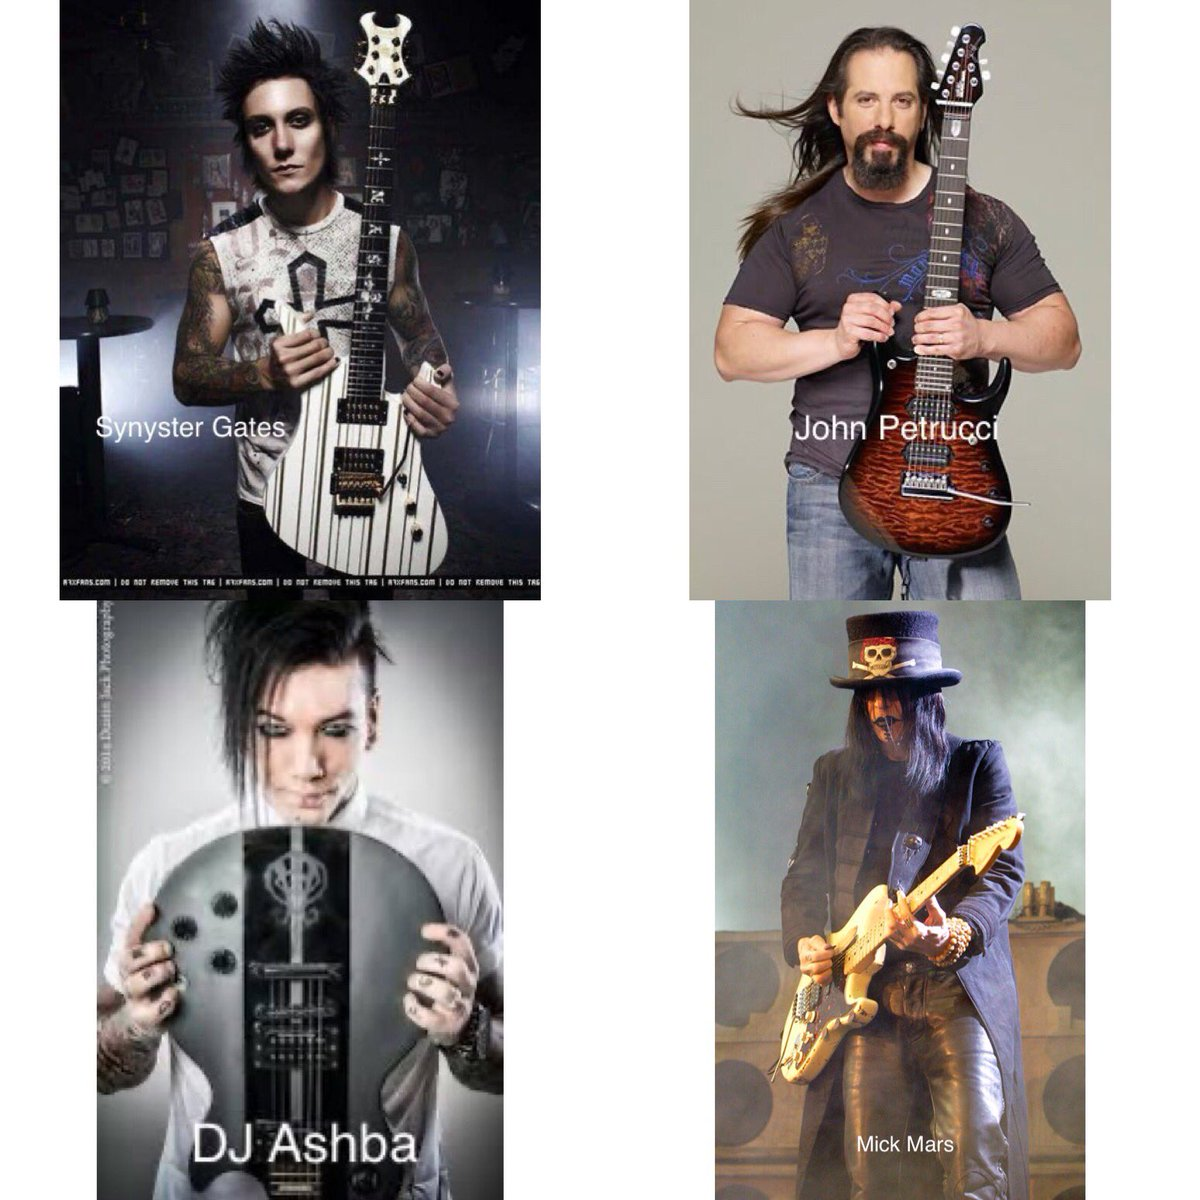 #GuitarWars ! Which #guitarist is your fave? #DJAshba - #JohnPetrucci - #SynysterGates - #MickMars ? Who do U think is best vs who do U like most? #guitarist #guitar #rocknroll #rockstar #poll #rockband #avengedsevenfold #dreamtheater #sixxam #motleycrue #guitarplayer #inspirepic.twitter.com/acg8XyOPI3